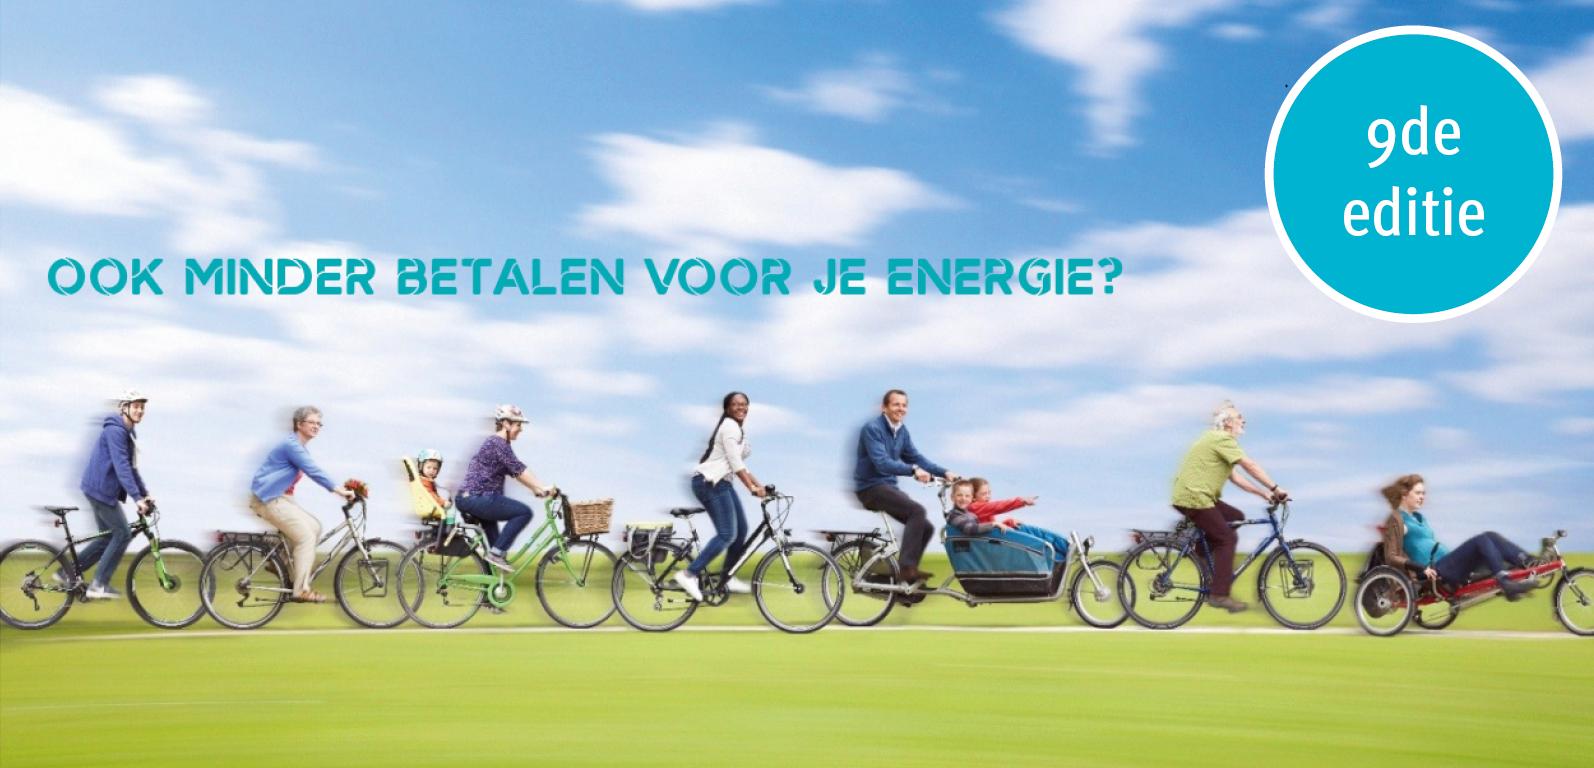 Groepsaankoop groene stroom en aardgas - 9de editie